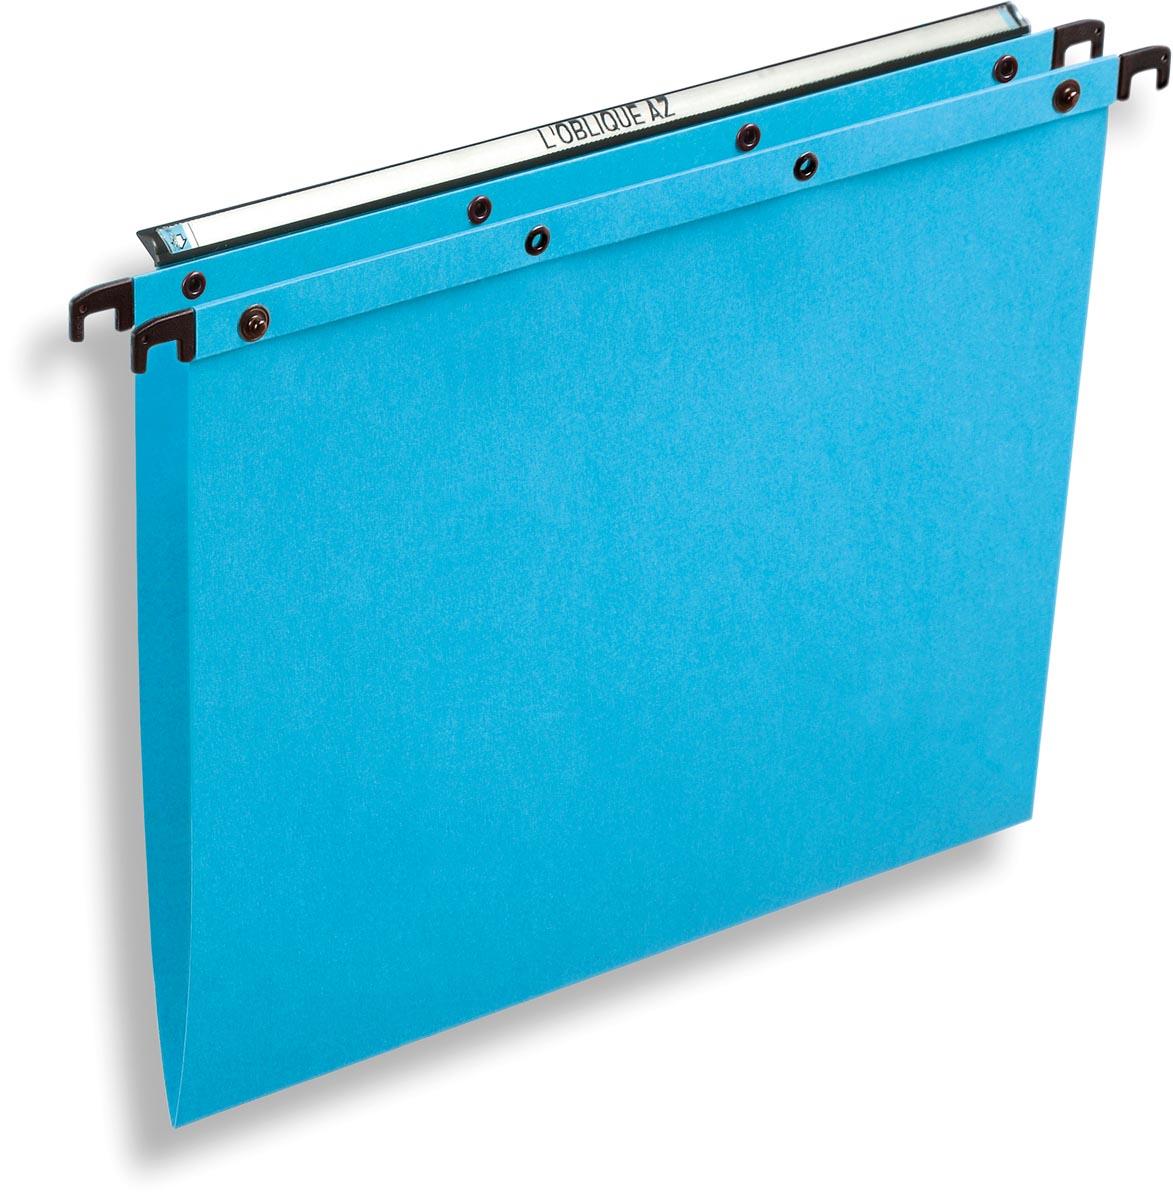 L'Oblique hangmappen voor laden AZO tussenafstand 330 mm (A4), V-bodem, blauw